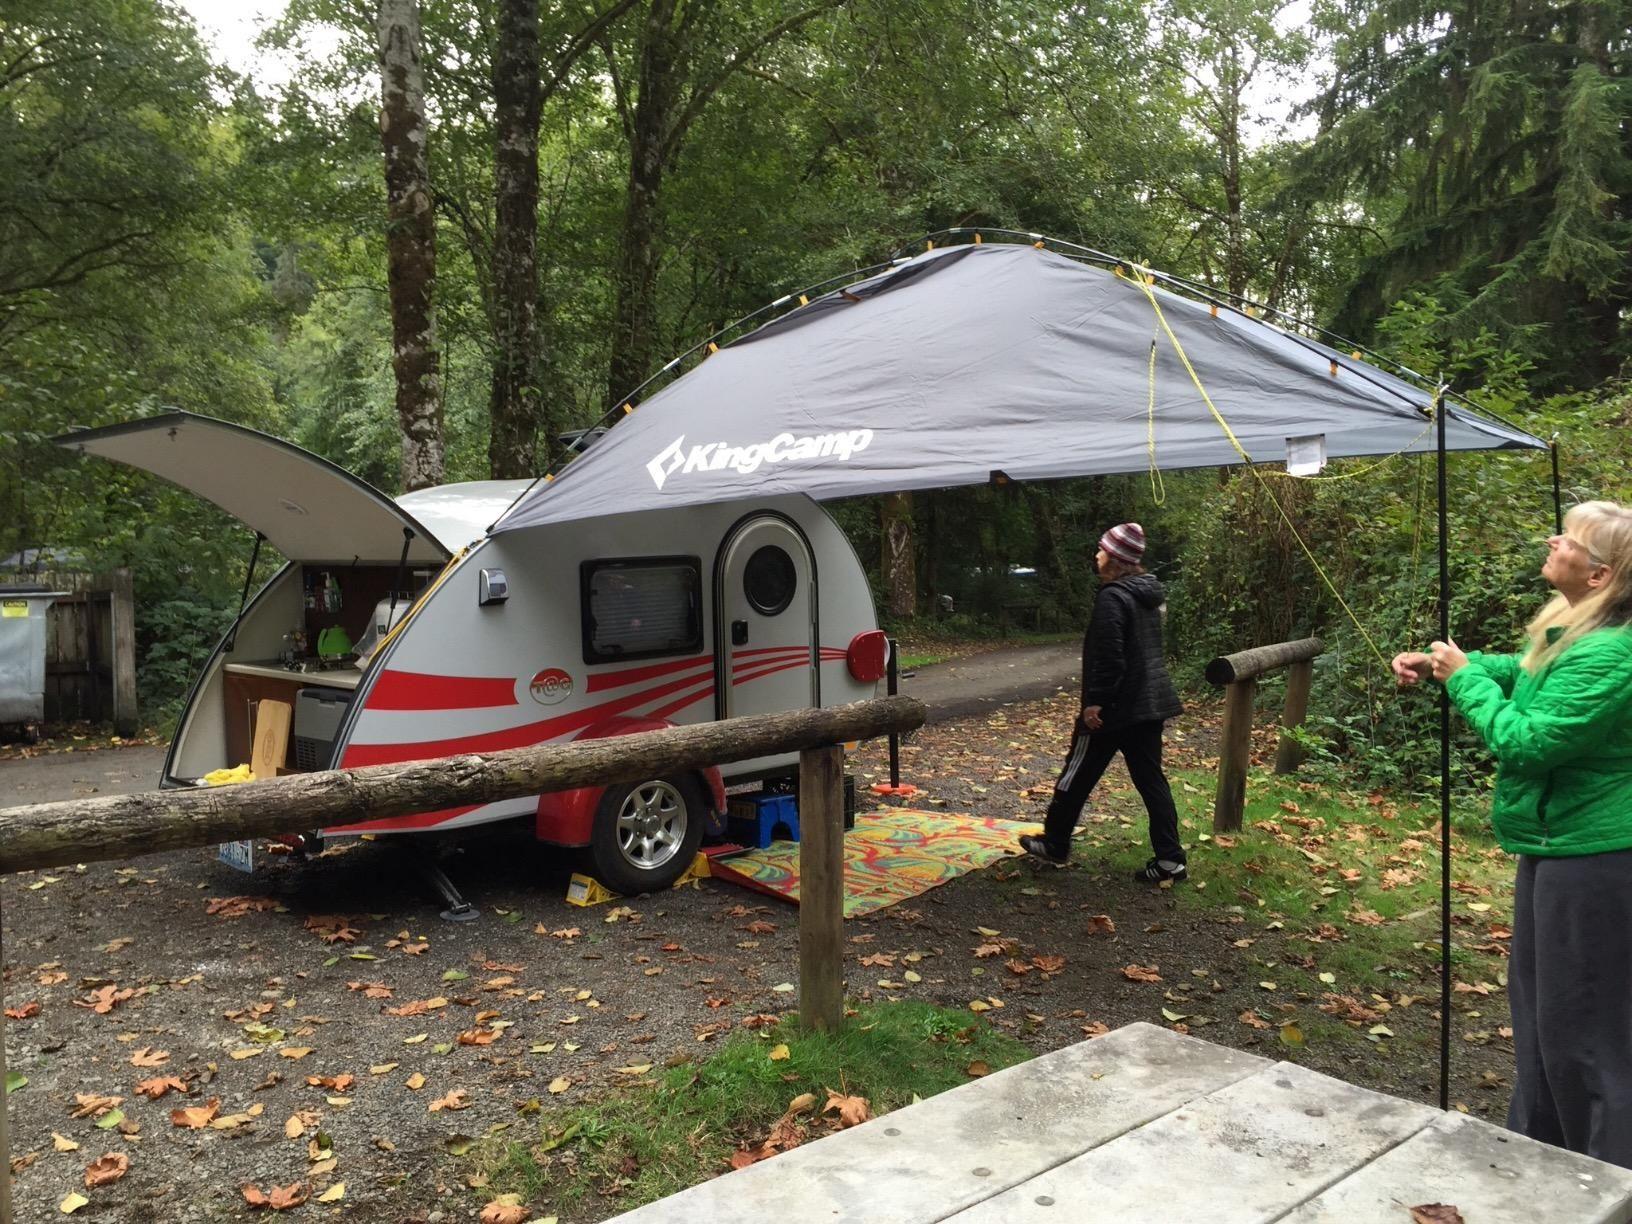 Amazon Com Kingcamp Compass Auto Shade Rip Stop Waterproof 1500mm Seam Taping Multifunctional Uses Suv Shade Sports Outdoo Suv Tent Car Shade Tent